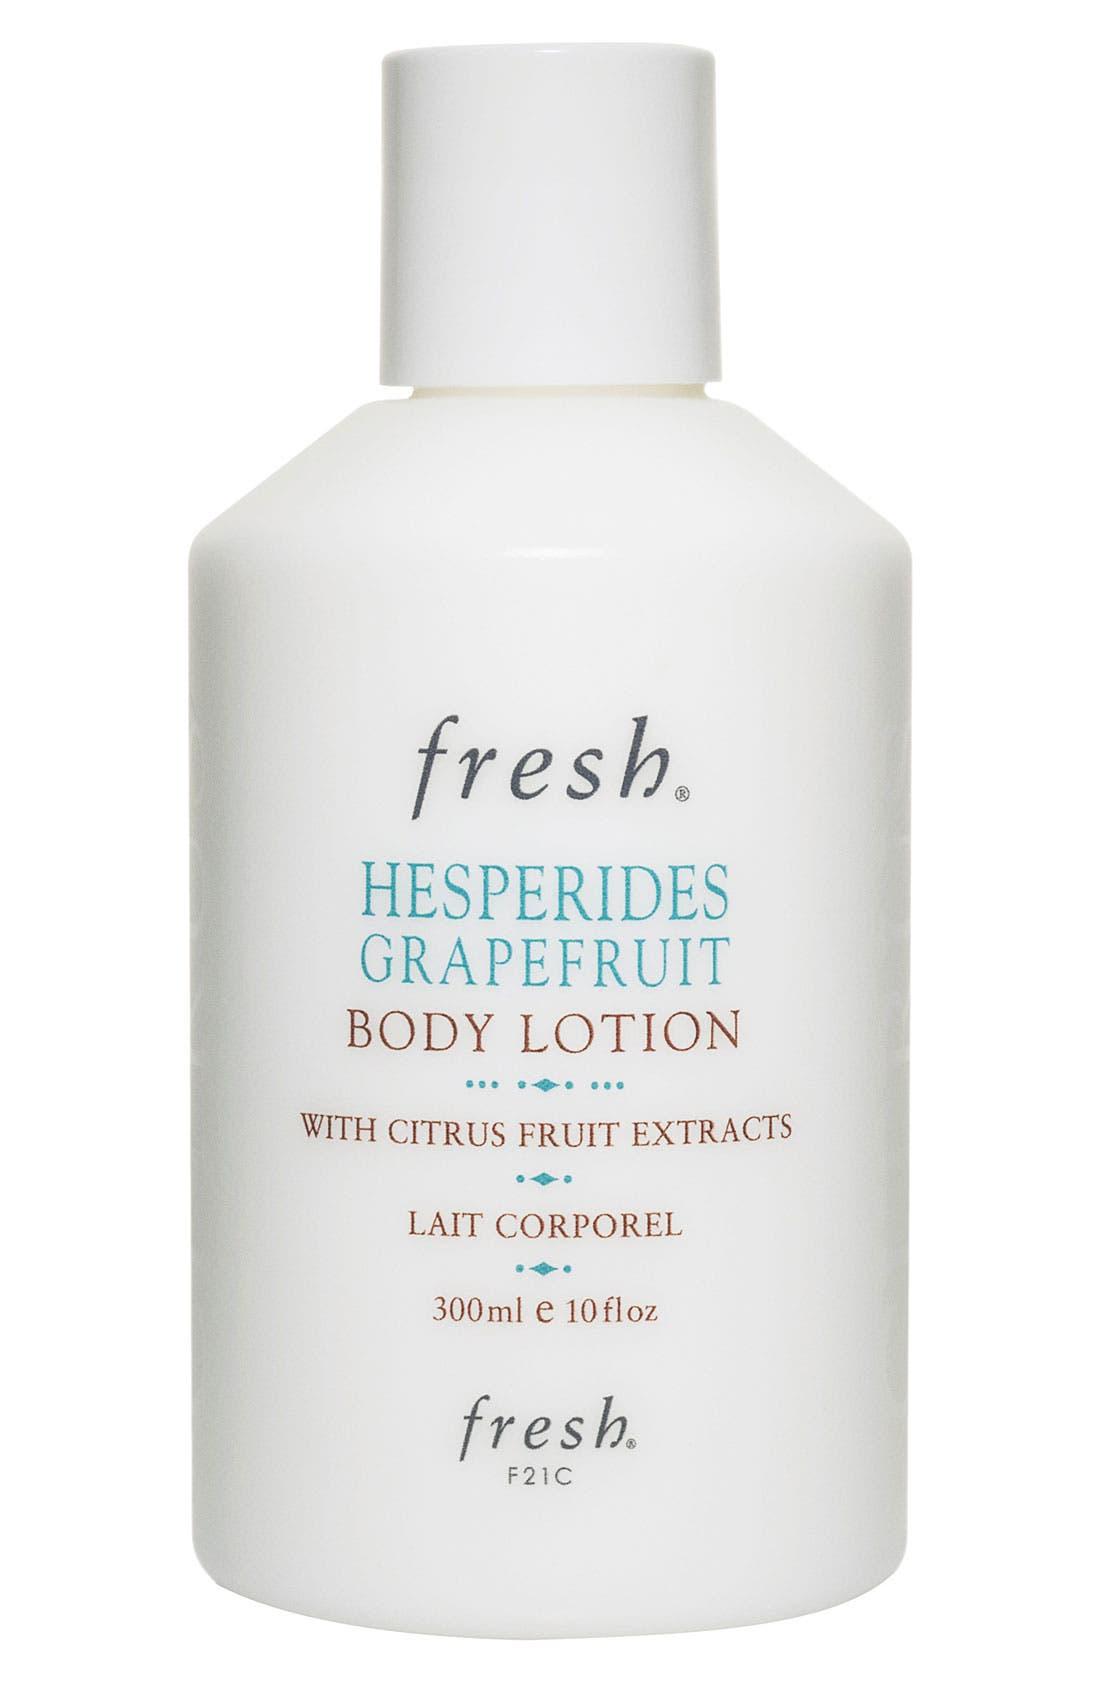 Fresh® 'Hesperides Grapefruit' Body Lotion